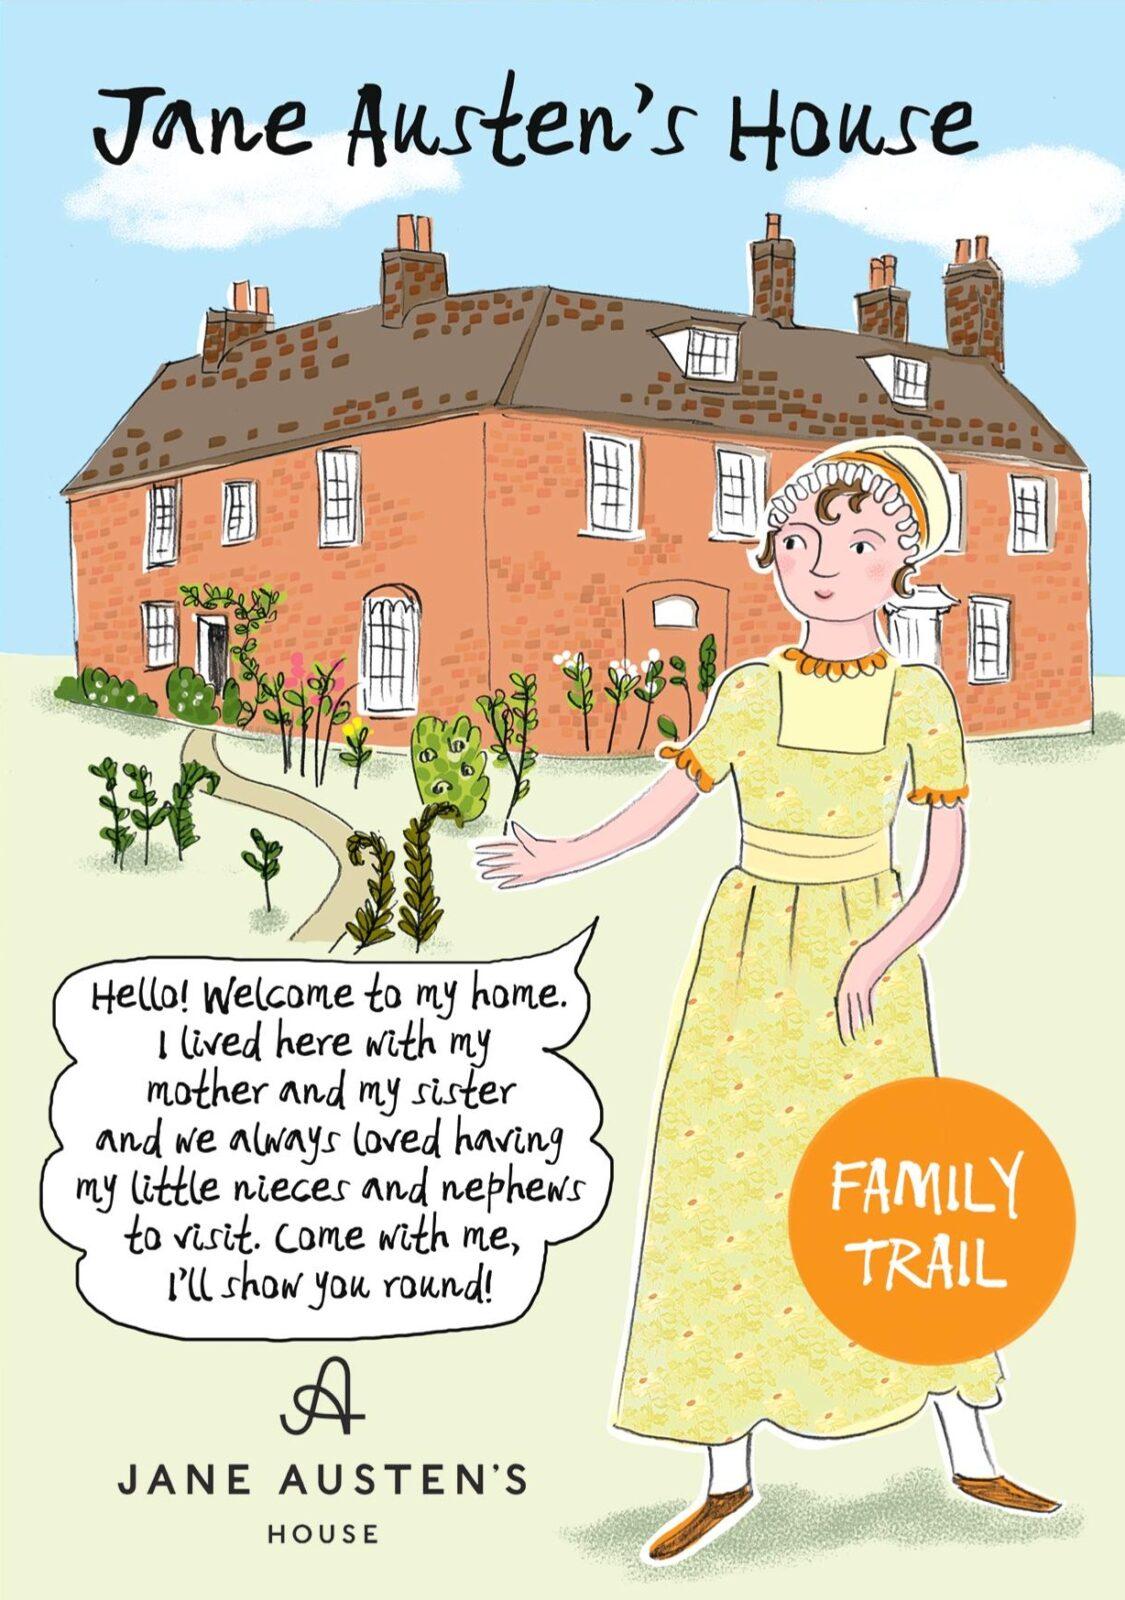 An illustration of Jane Austen in front of Jane Austen's House